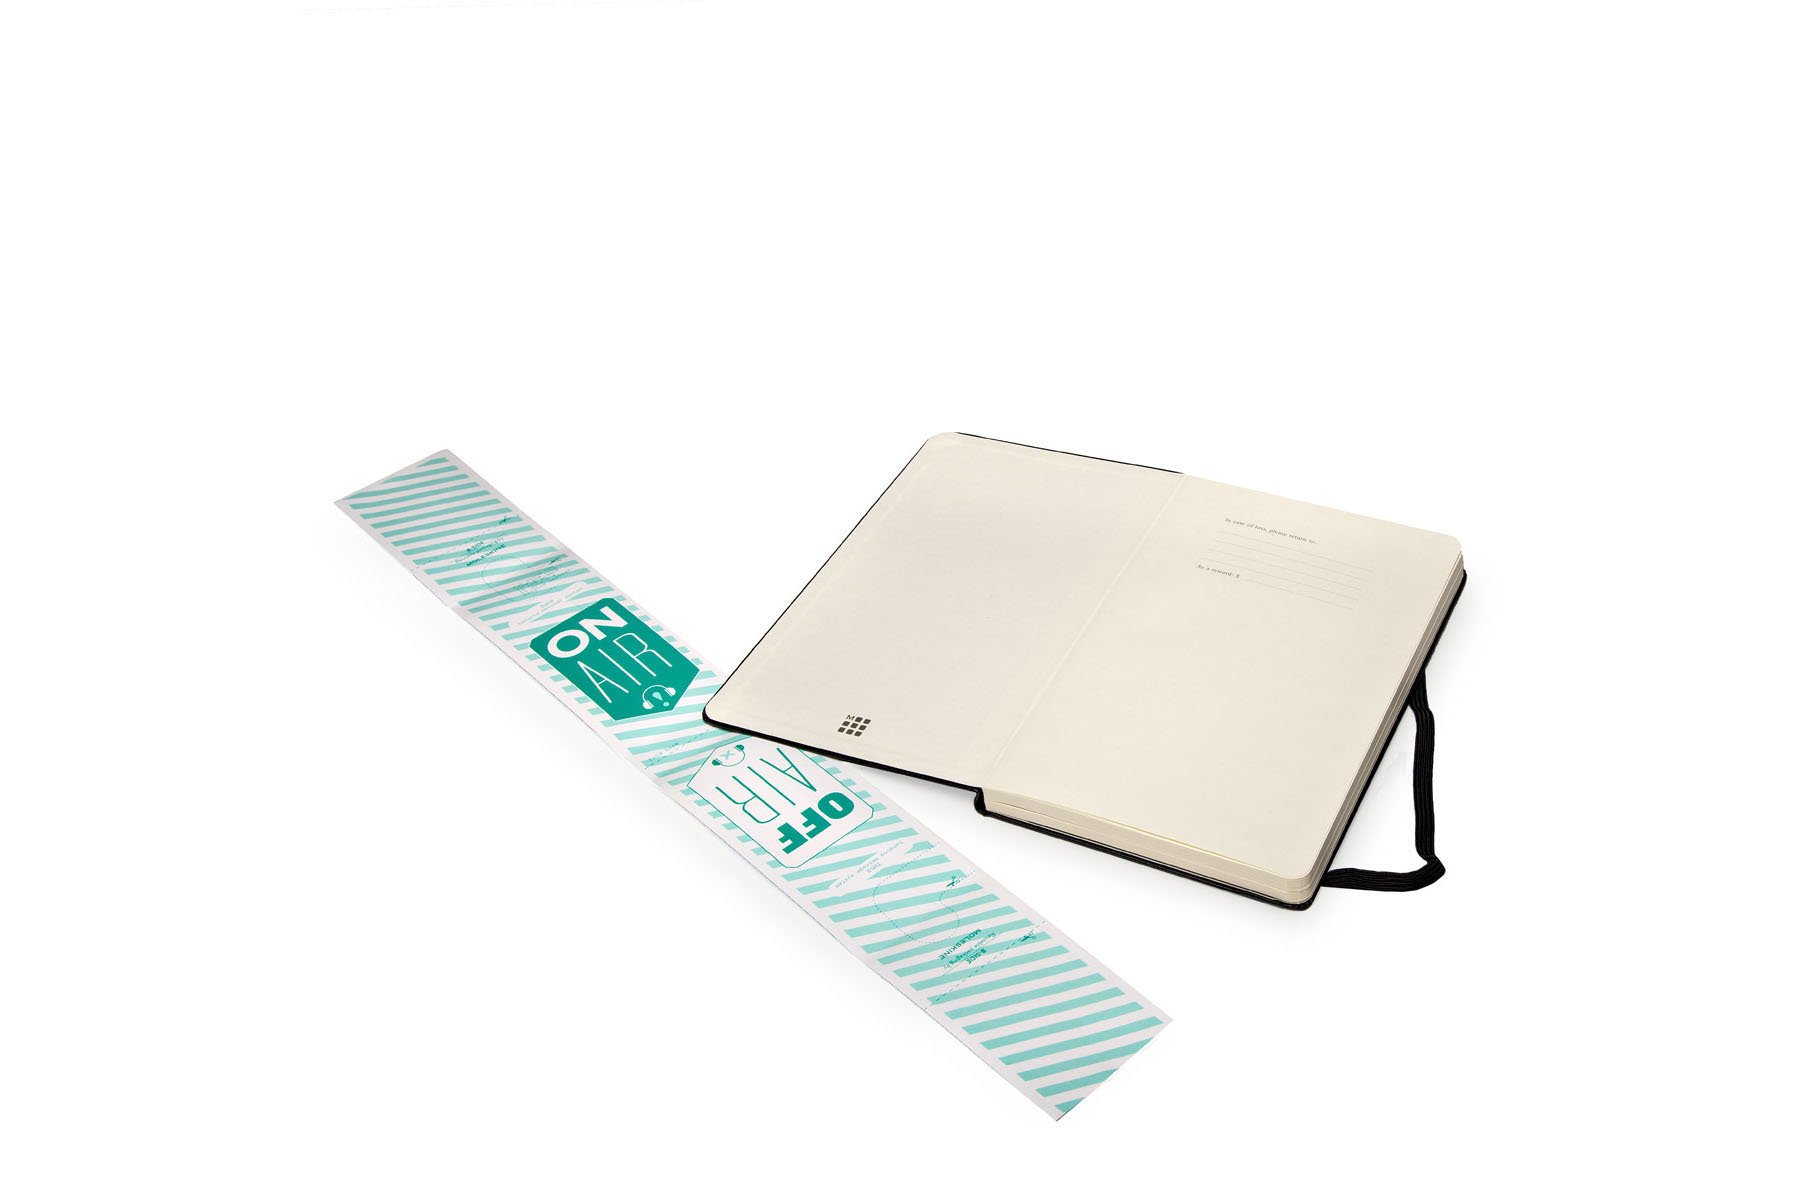 Moleskine Art Plus Music Notebook, Large, Black, Hard Cover (5 x 8.25)